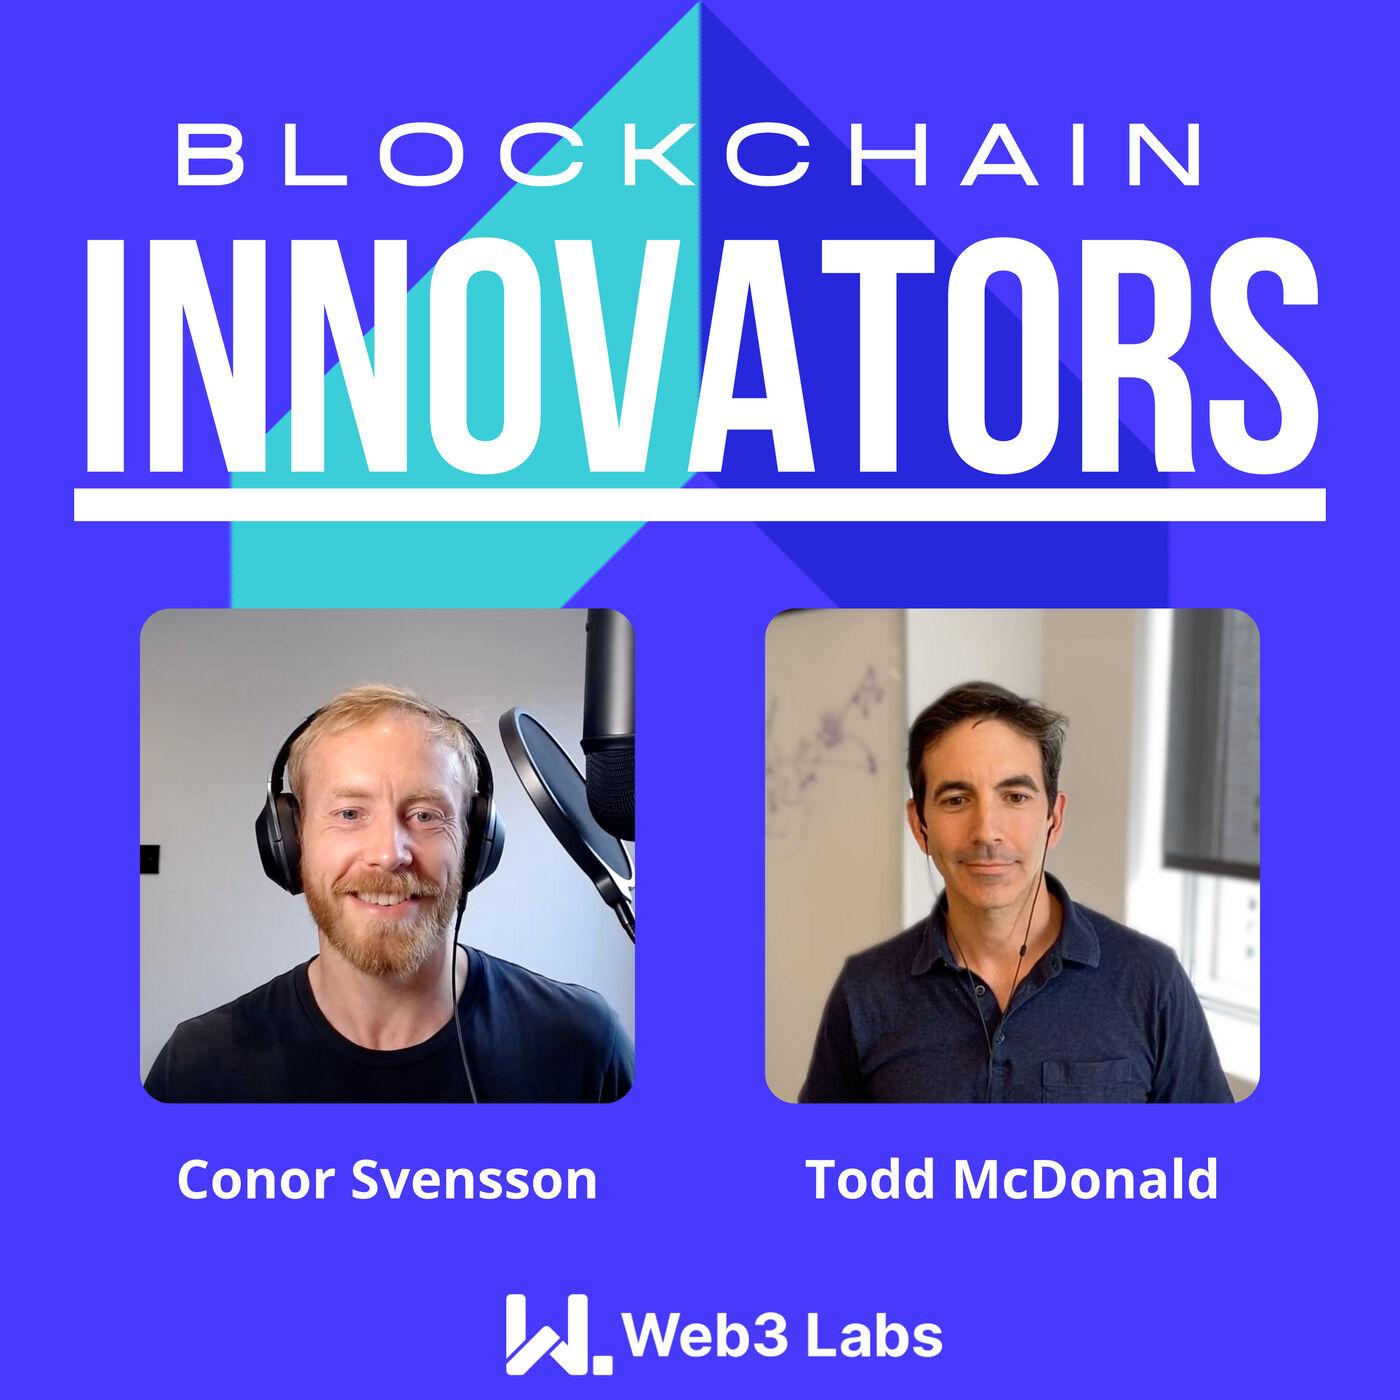 Blockchain Innovators with Conor Svensson and Todd McDonald